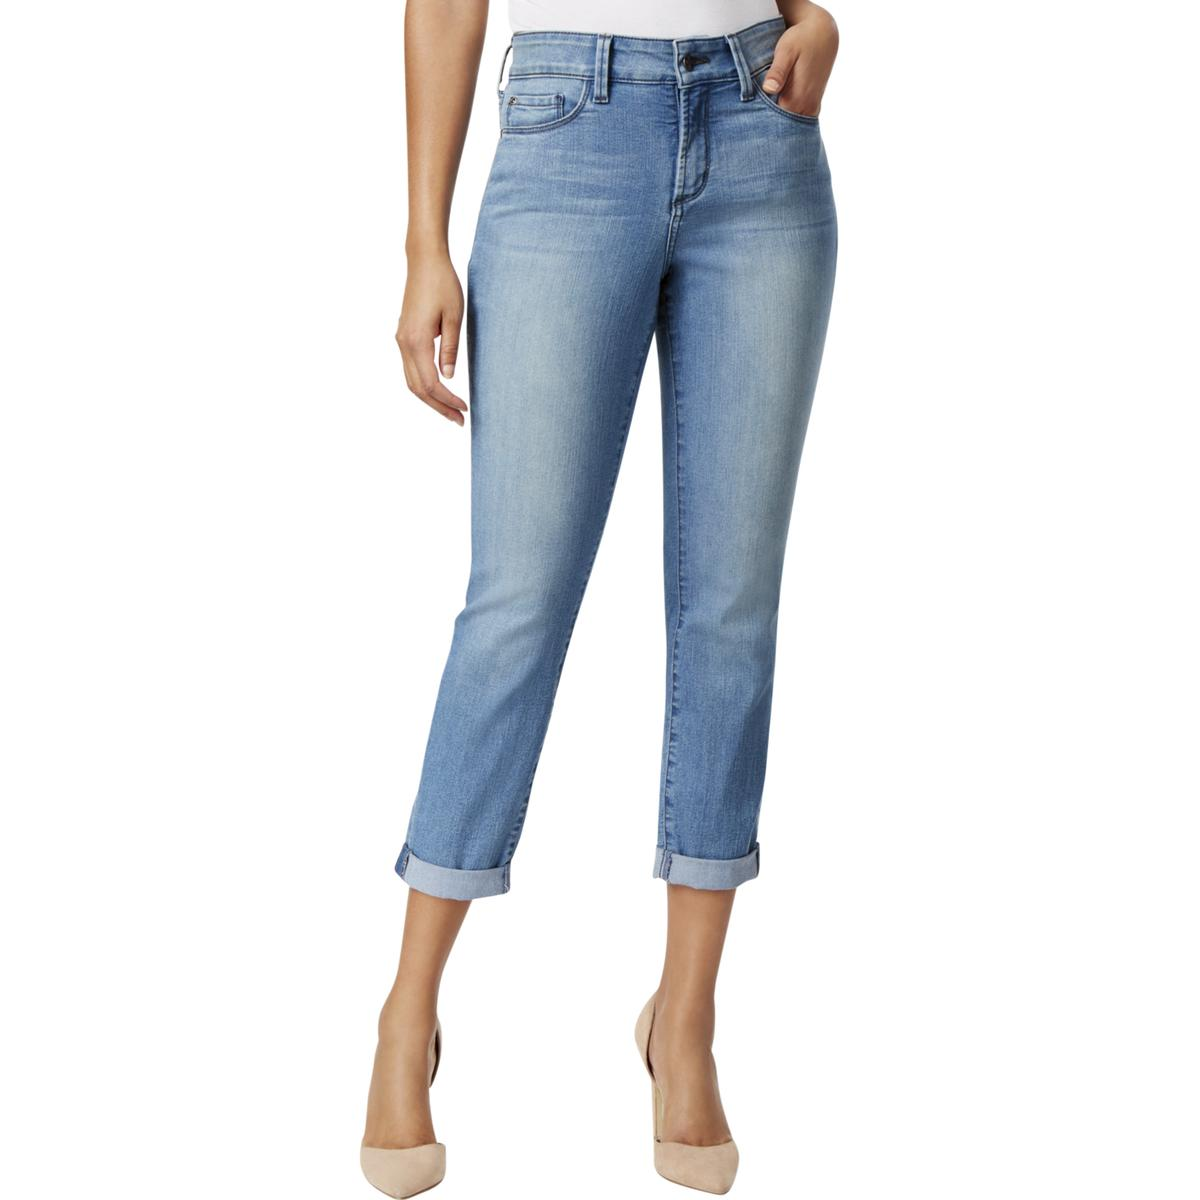 07a9ffd34b01b4 NYDJ Jetstream Alina Tummy Control Convertible Ankle Jeans Pants 2 ...